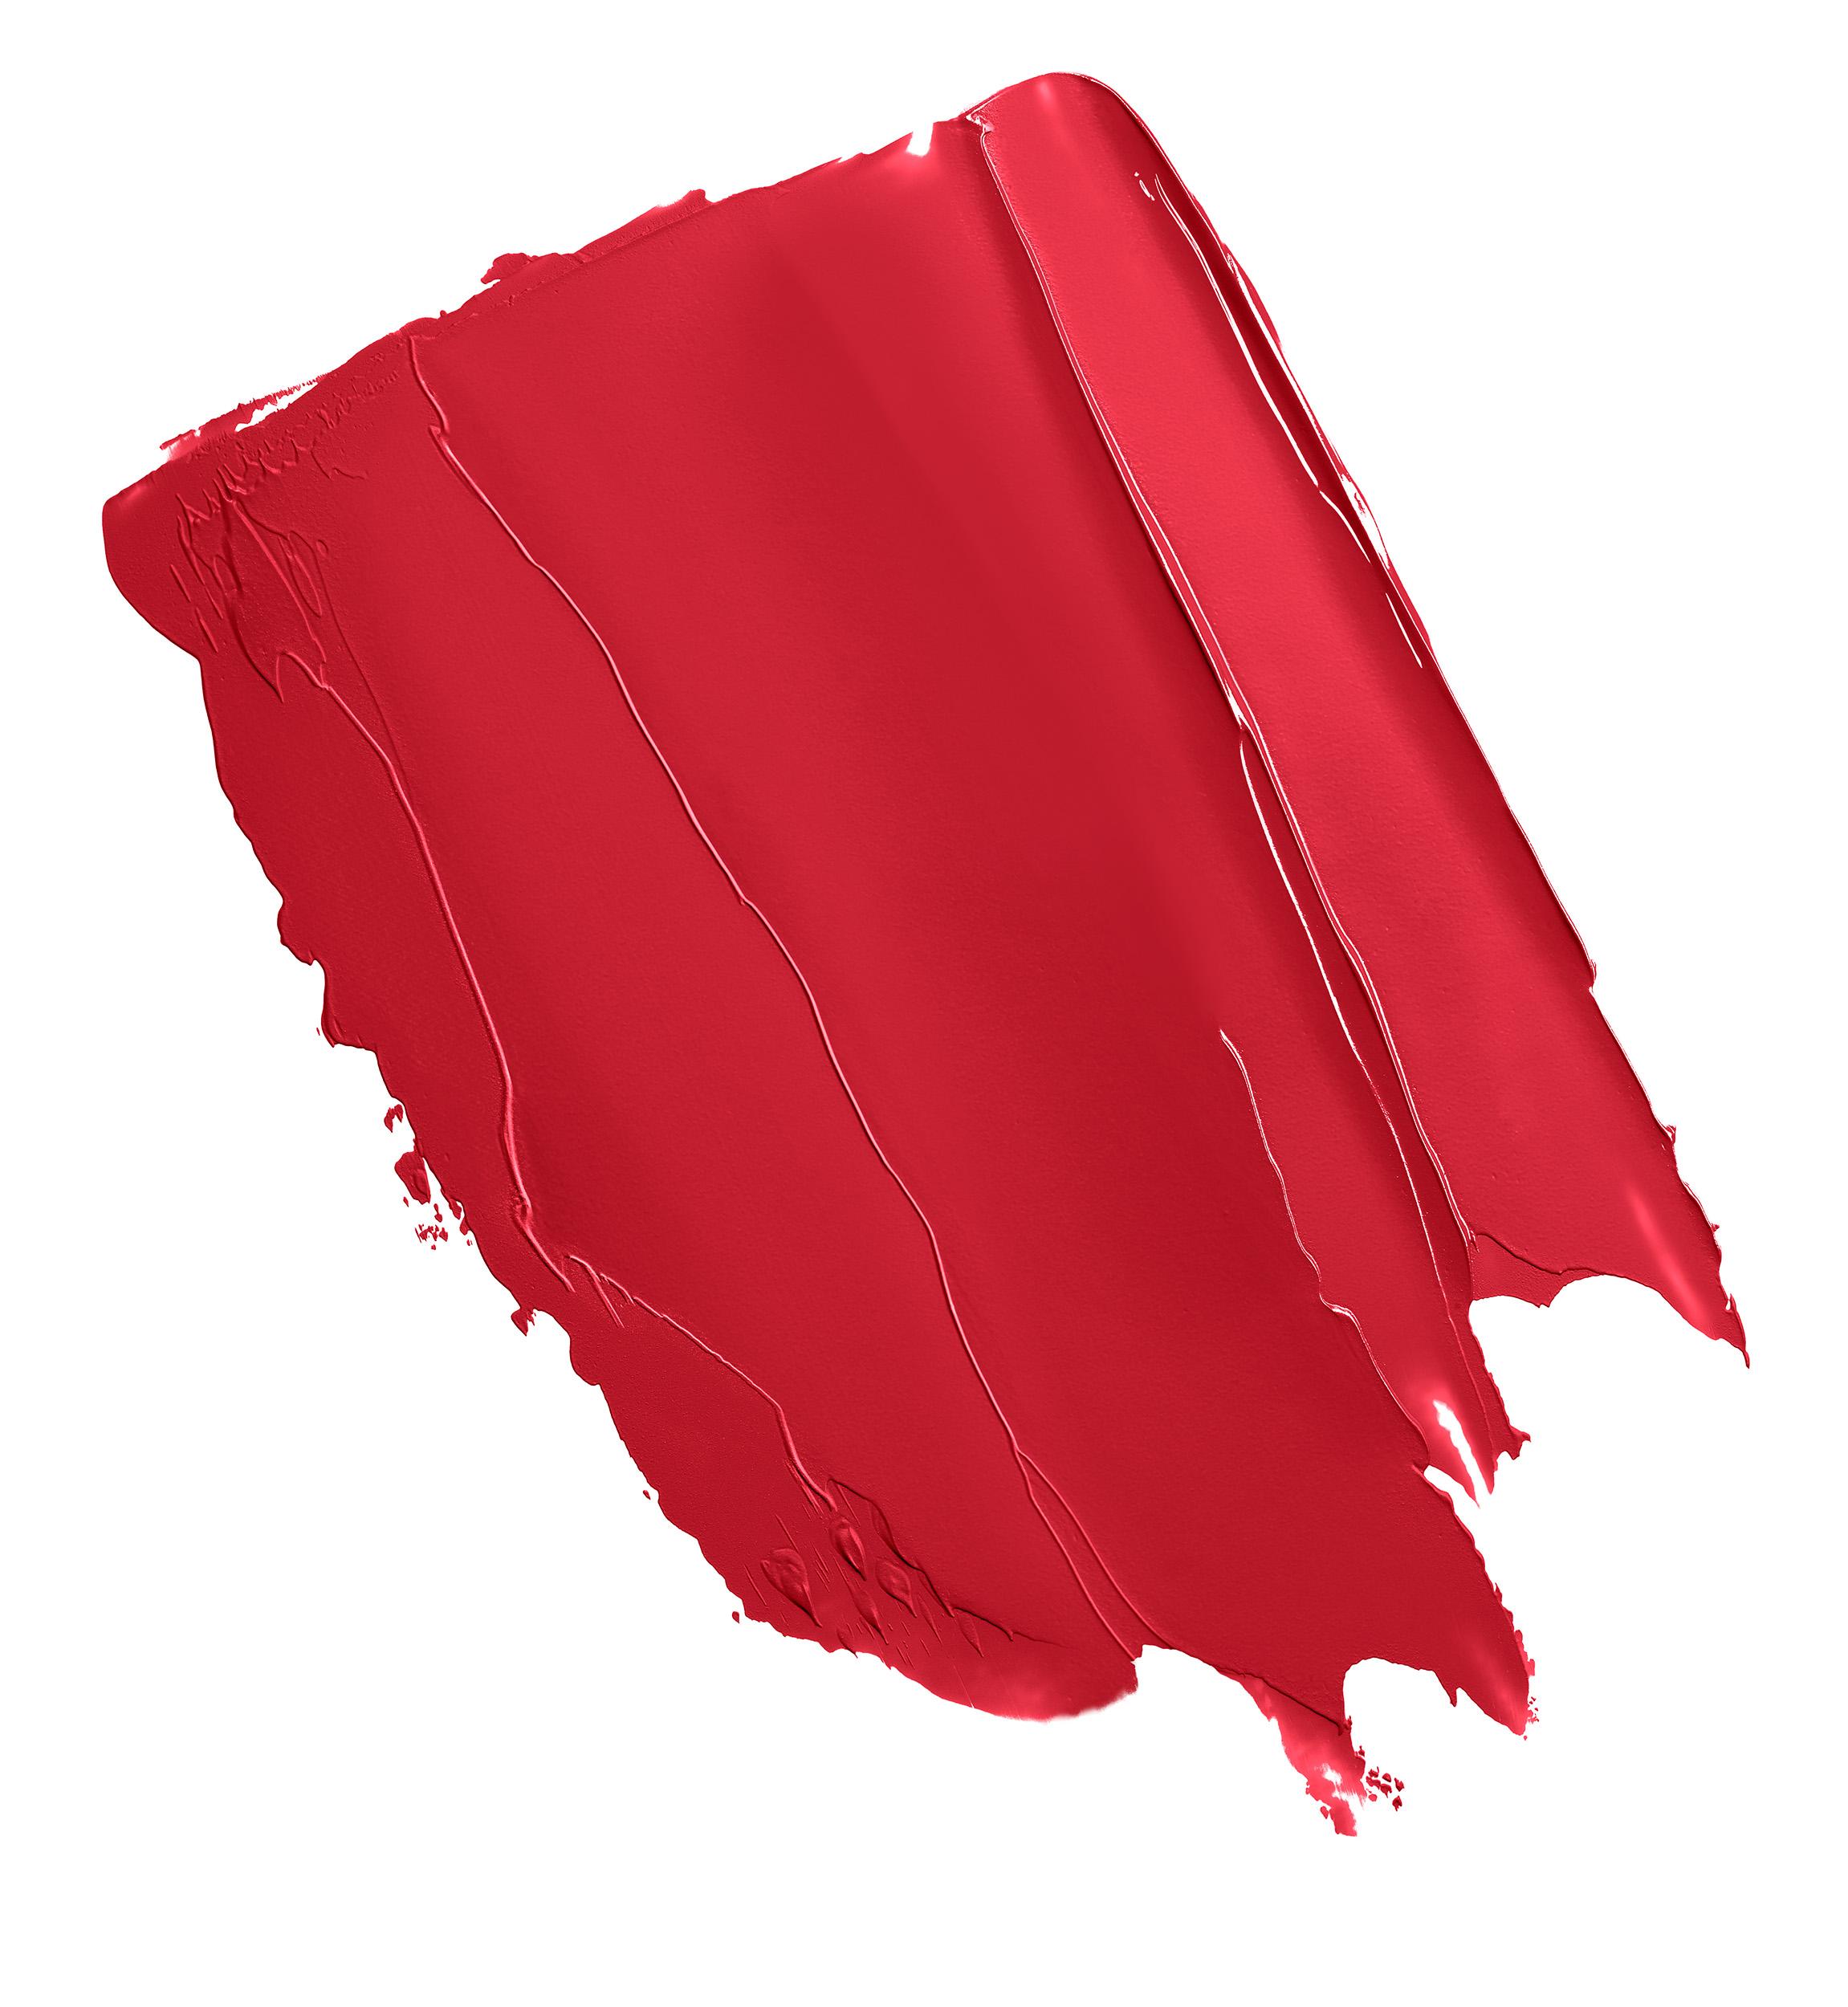 DIOR Rouge Dior Refillable Satin Lipstick, 743 rouge zinnia